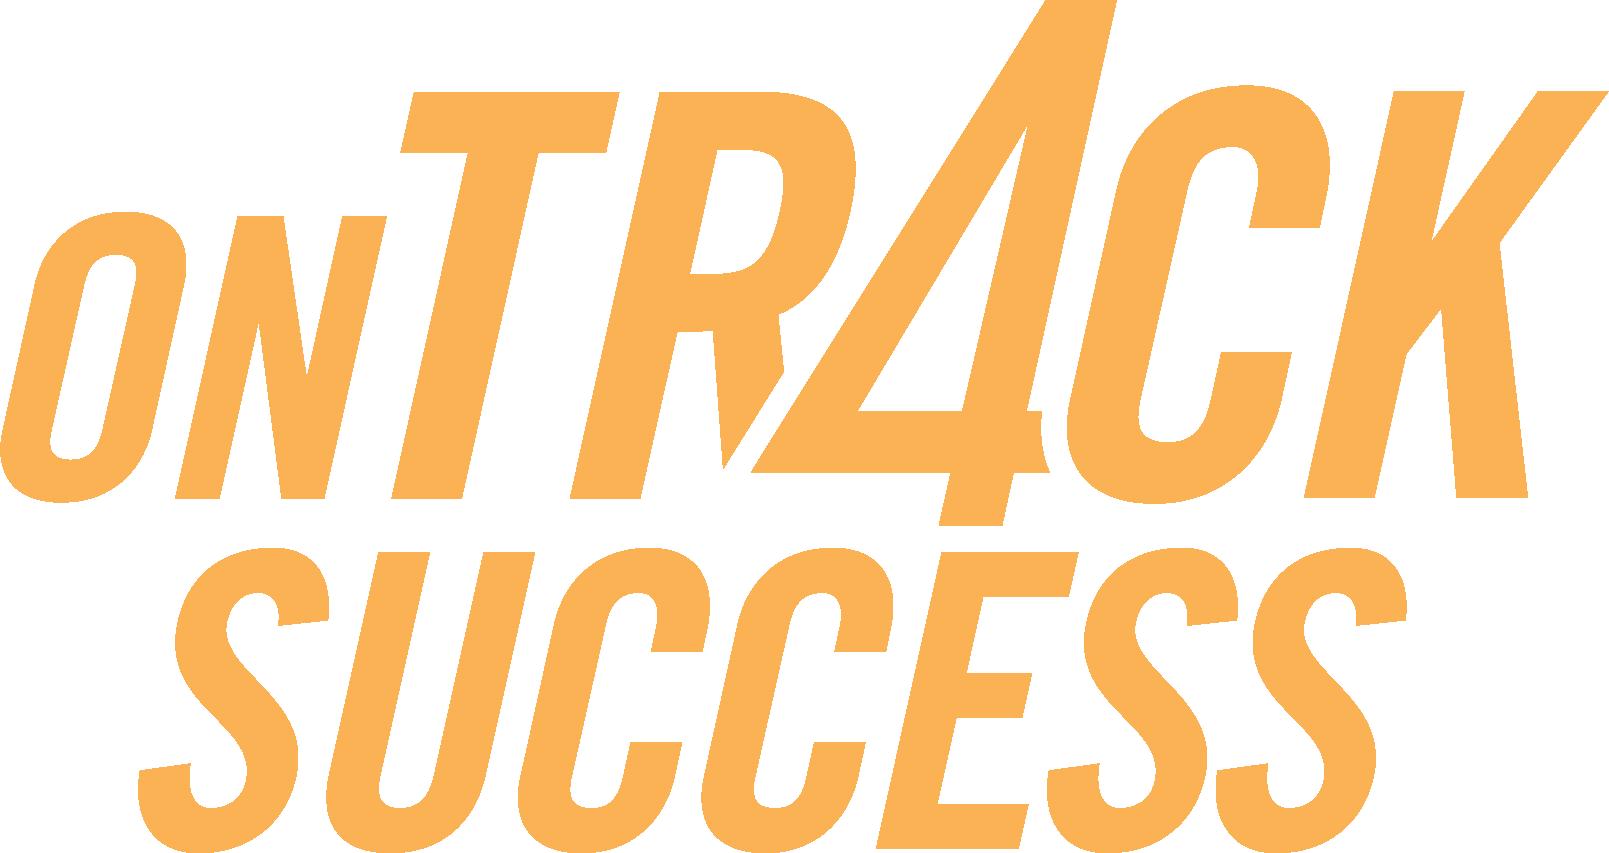 UWCM yellow On Track for Success Logo